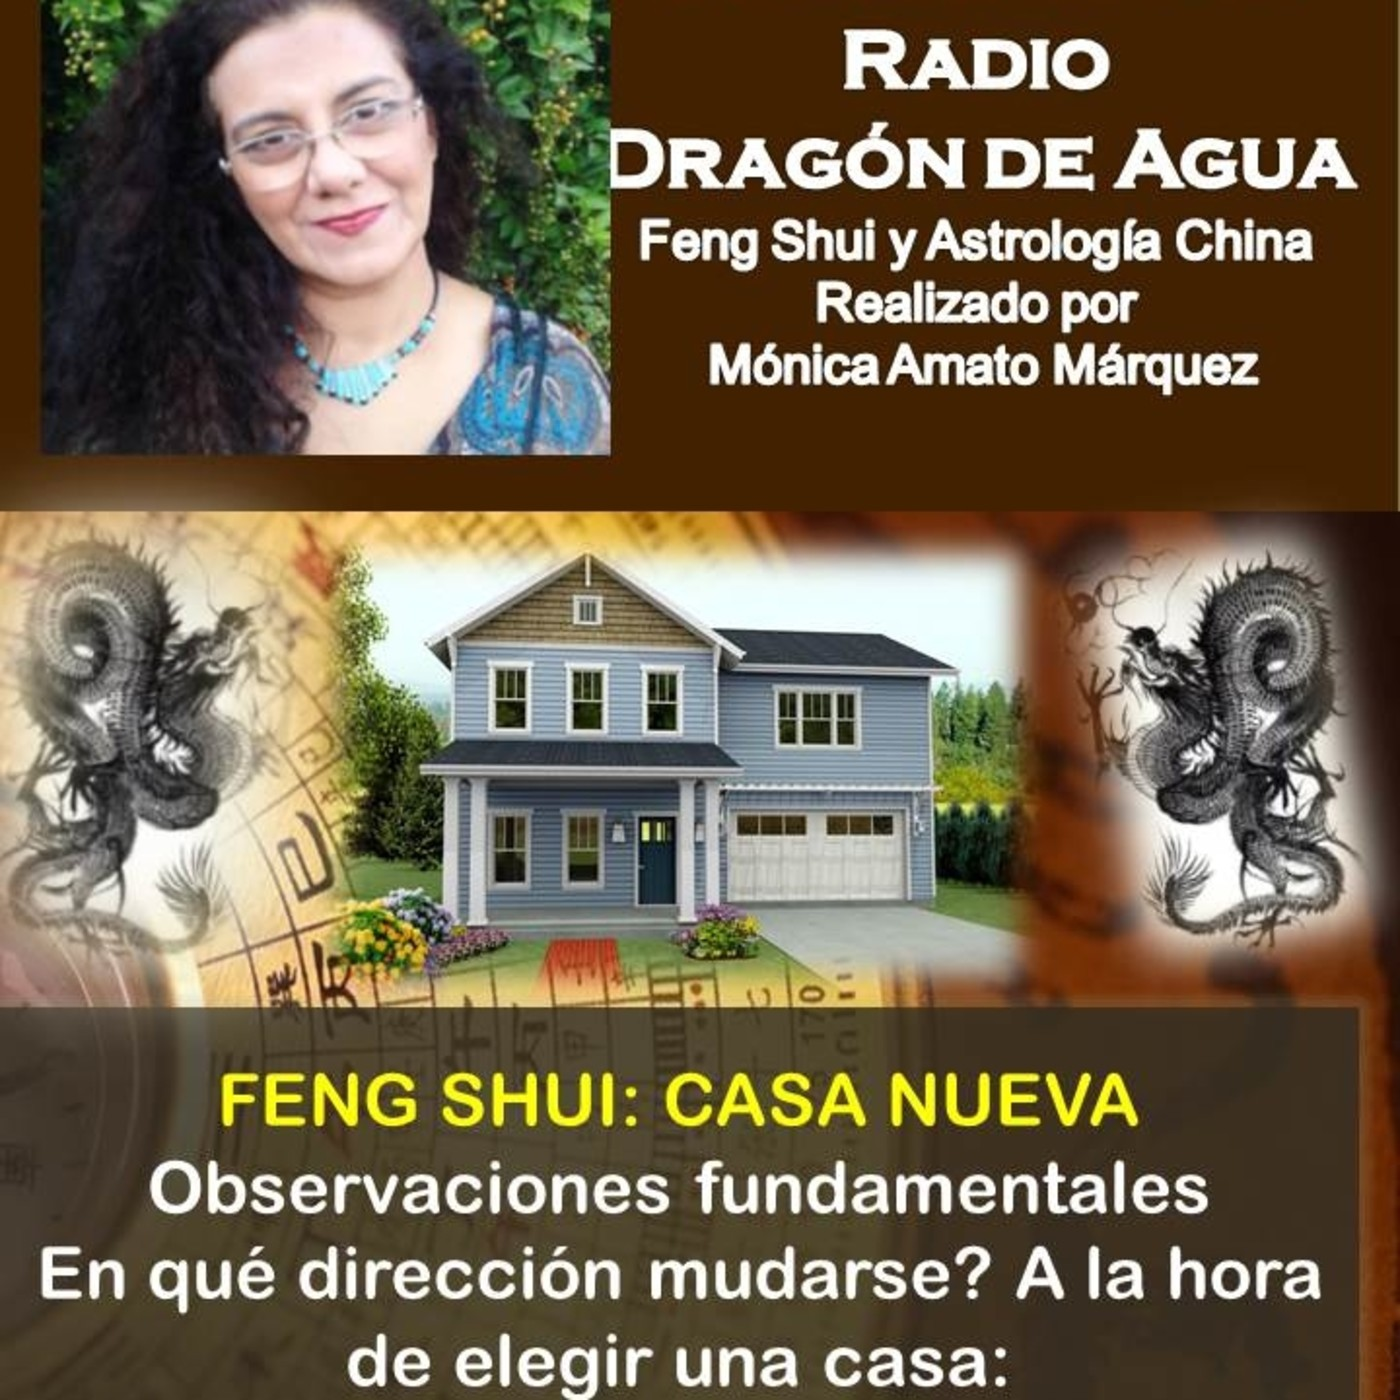 Feng shui casa nueva en podcast de dragondeagua en mp3 17 - Feng shui casa ...